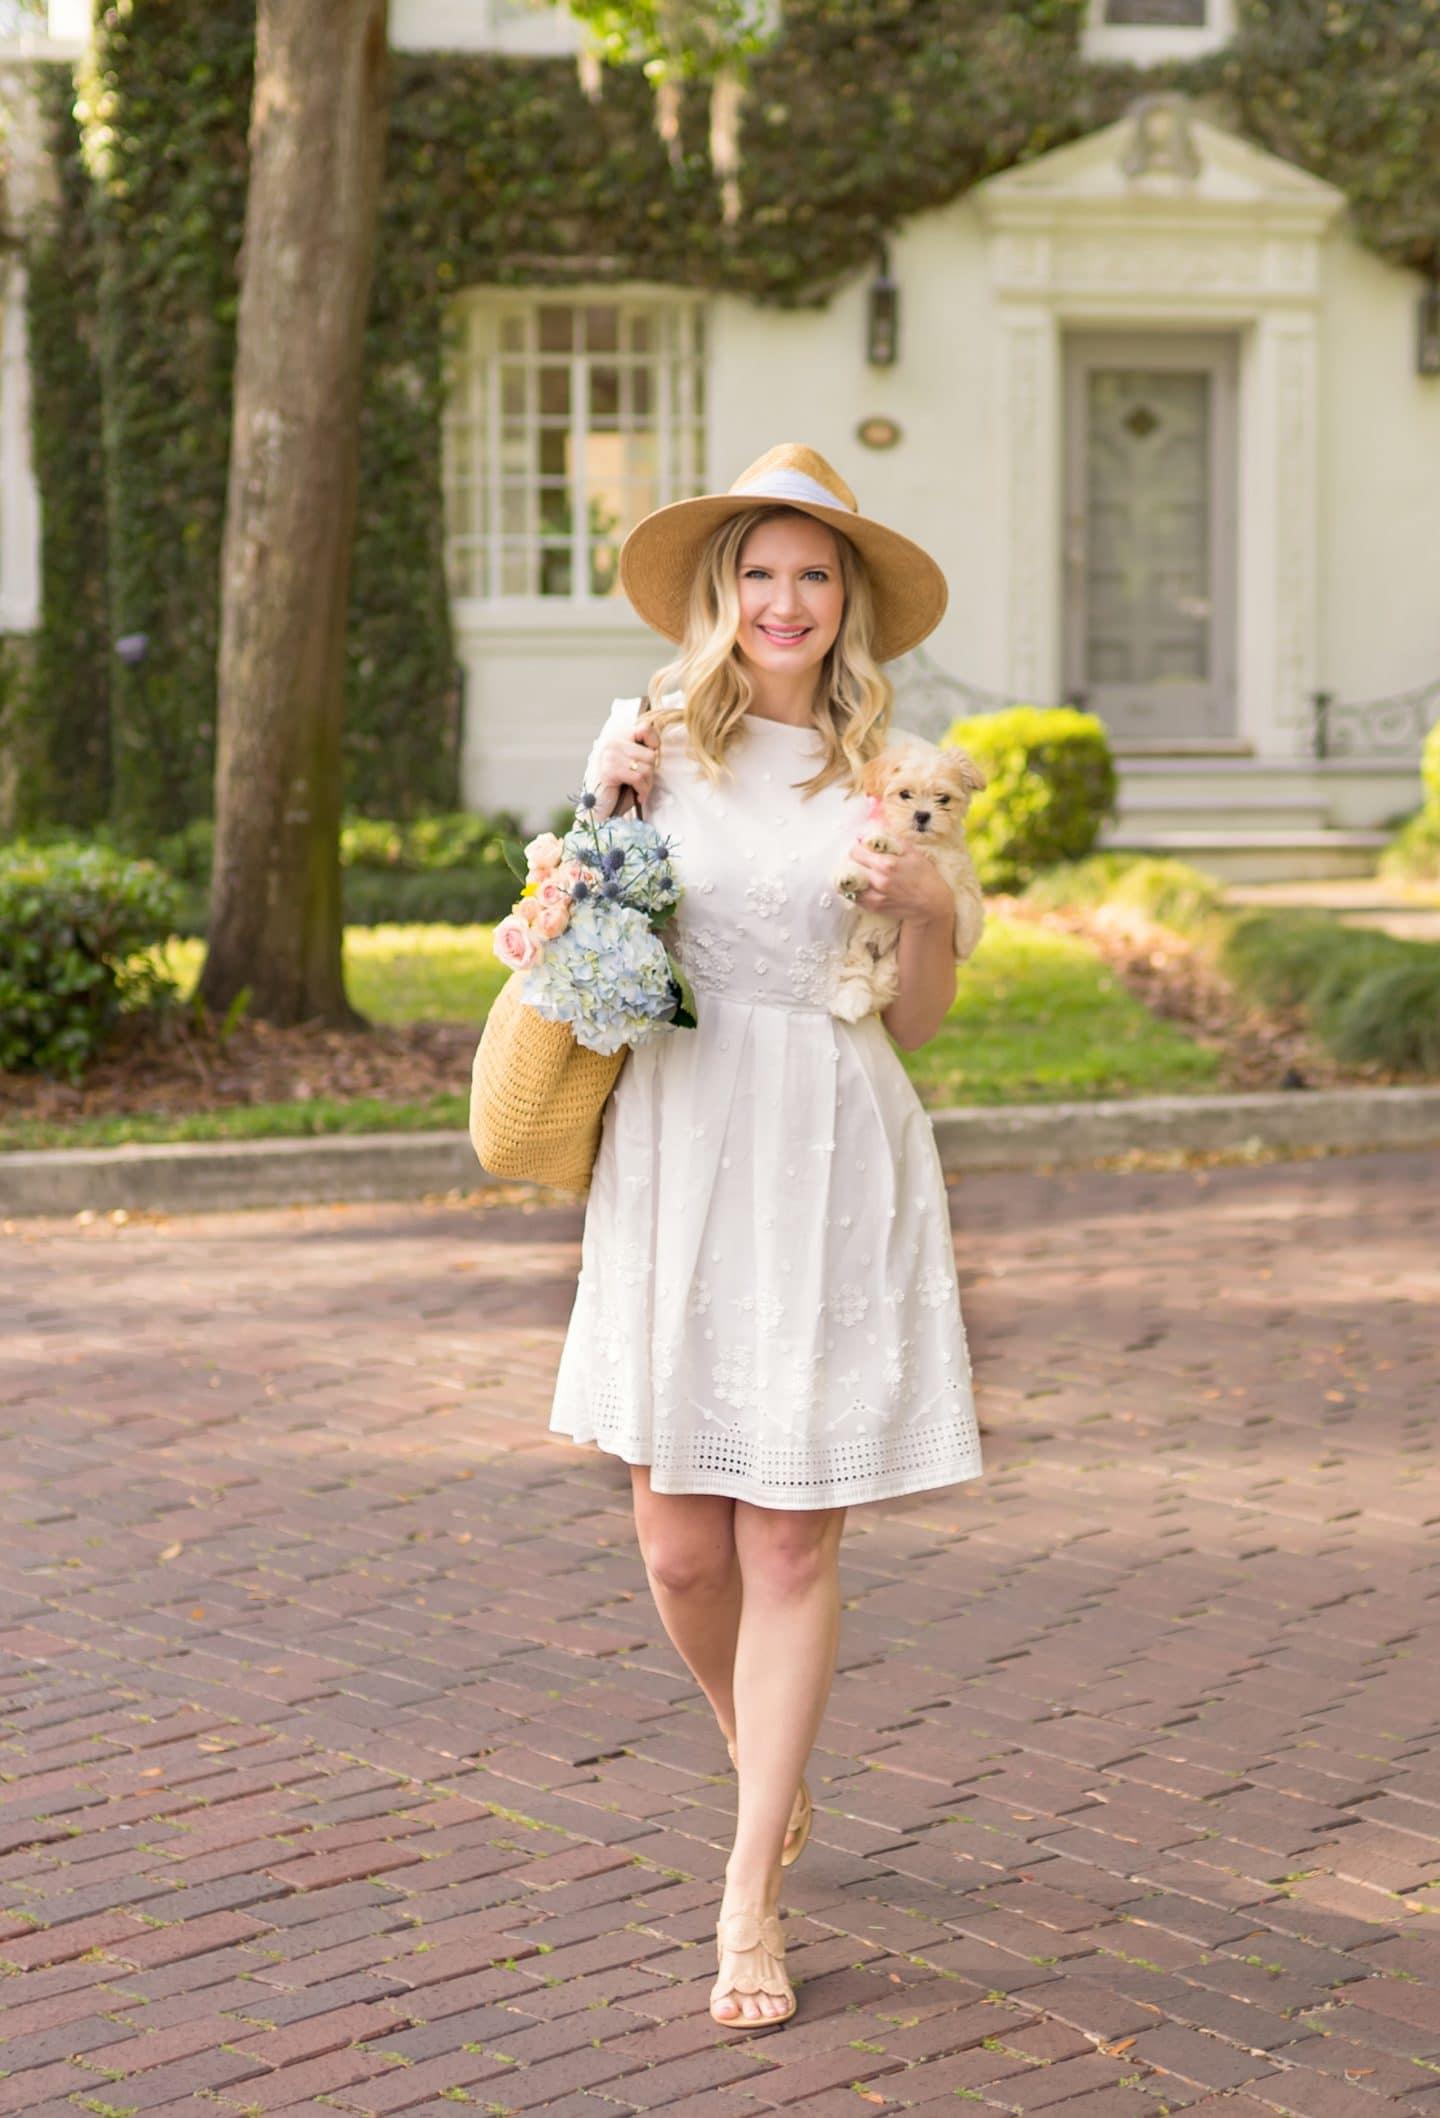 Ashley Brooke in White Maravea Charleston Day Dress - Ashley Brooke Designs